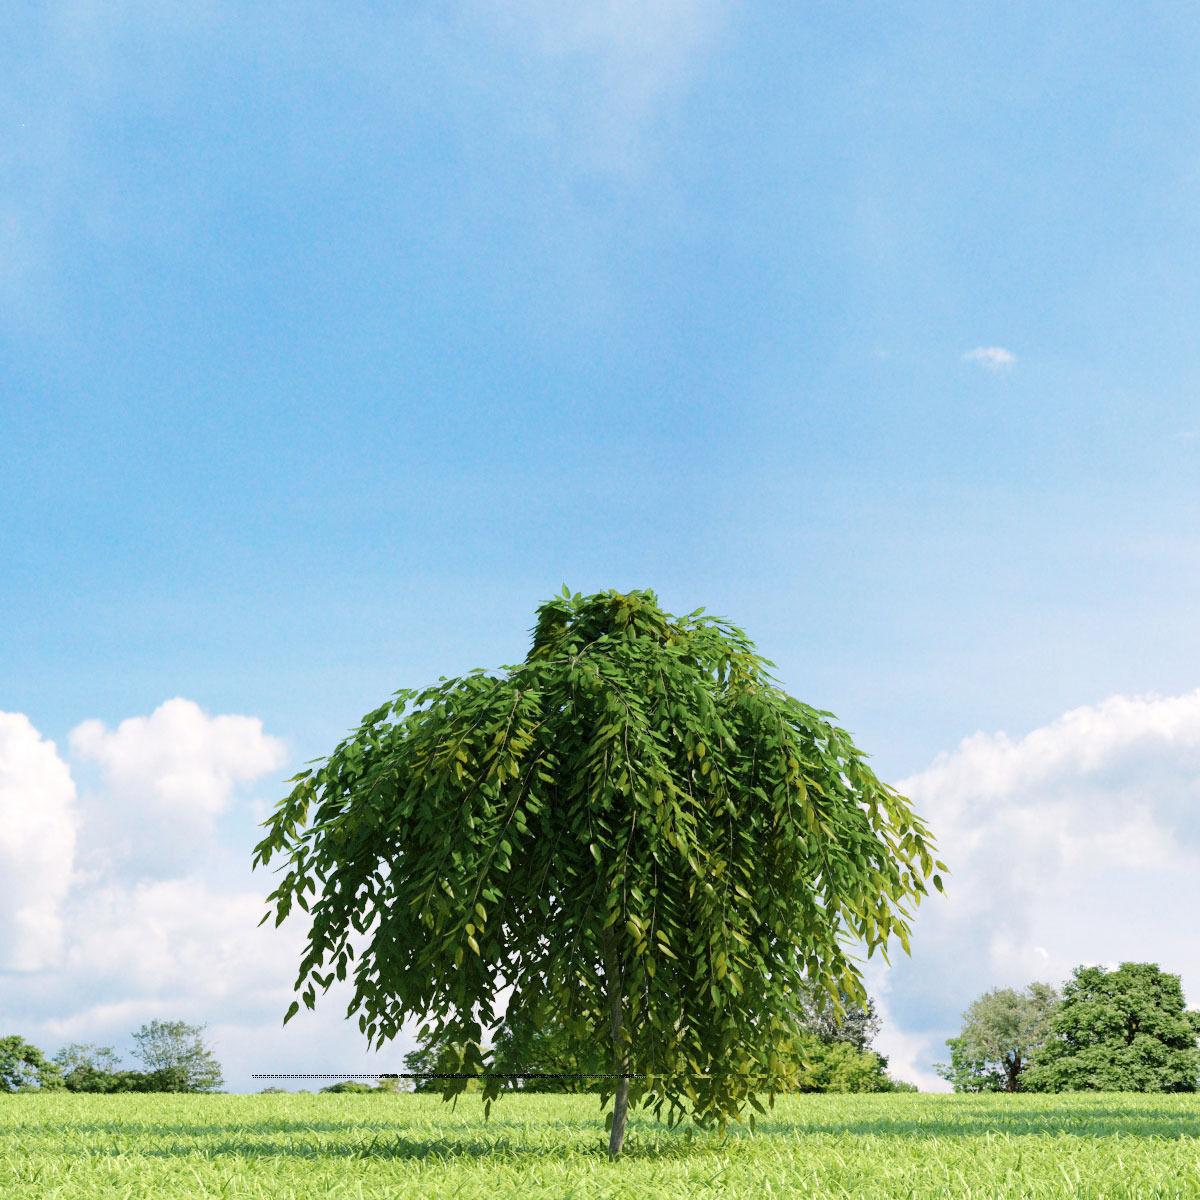 Salix repens var nitida 022 v1 AM136